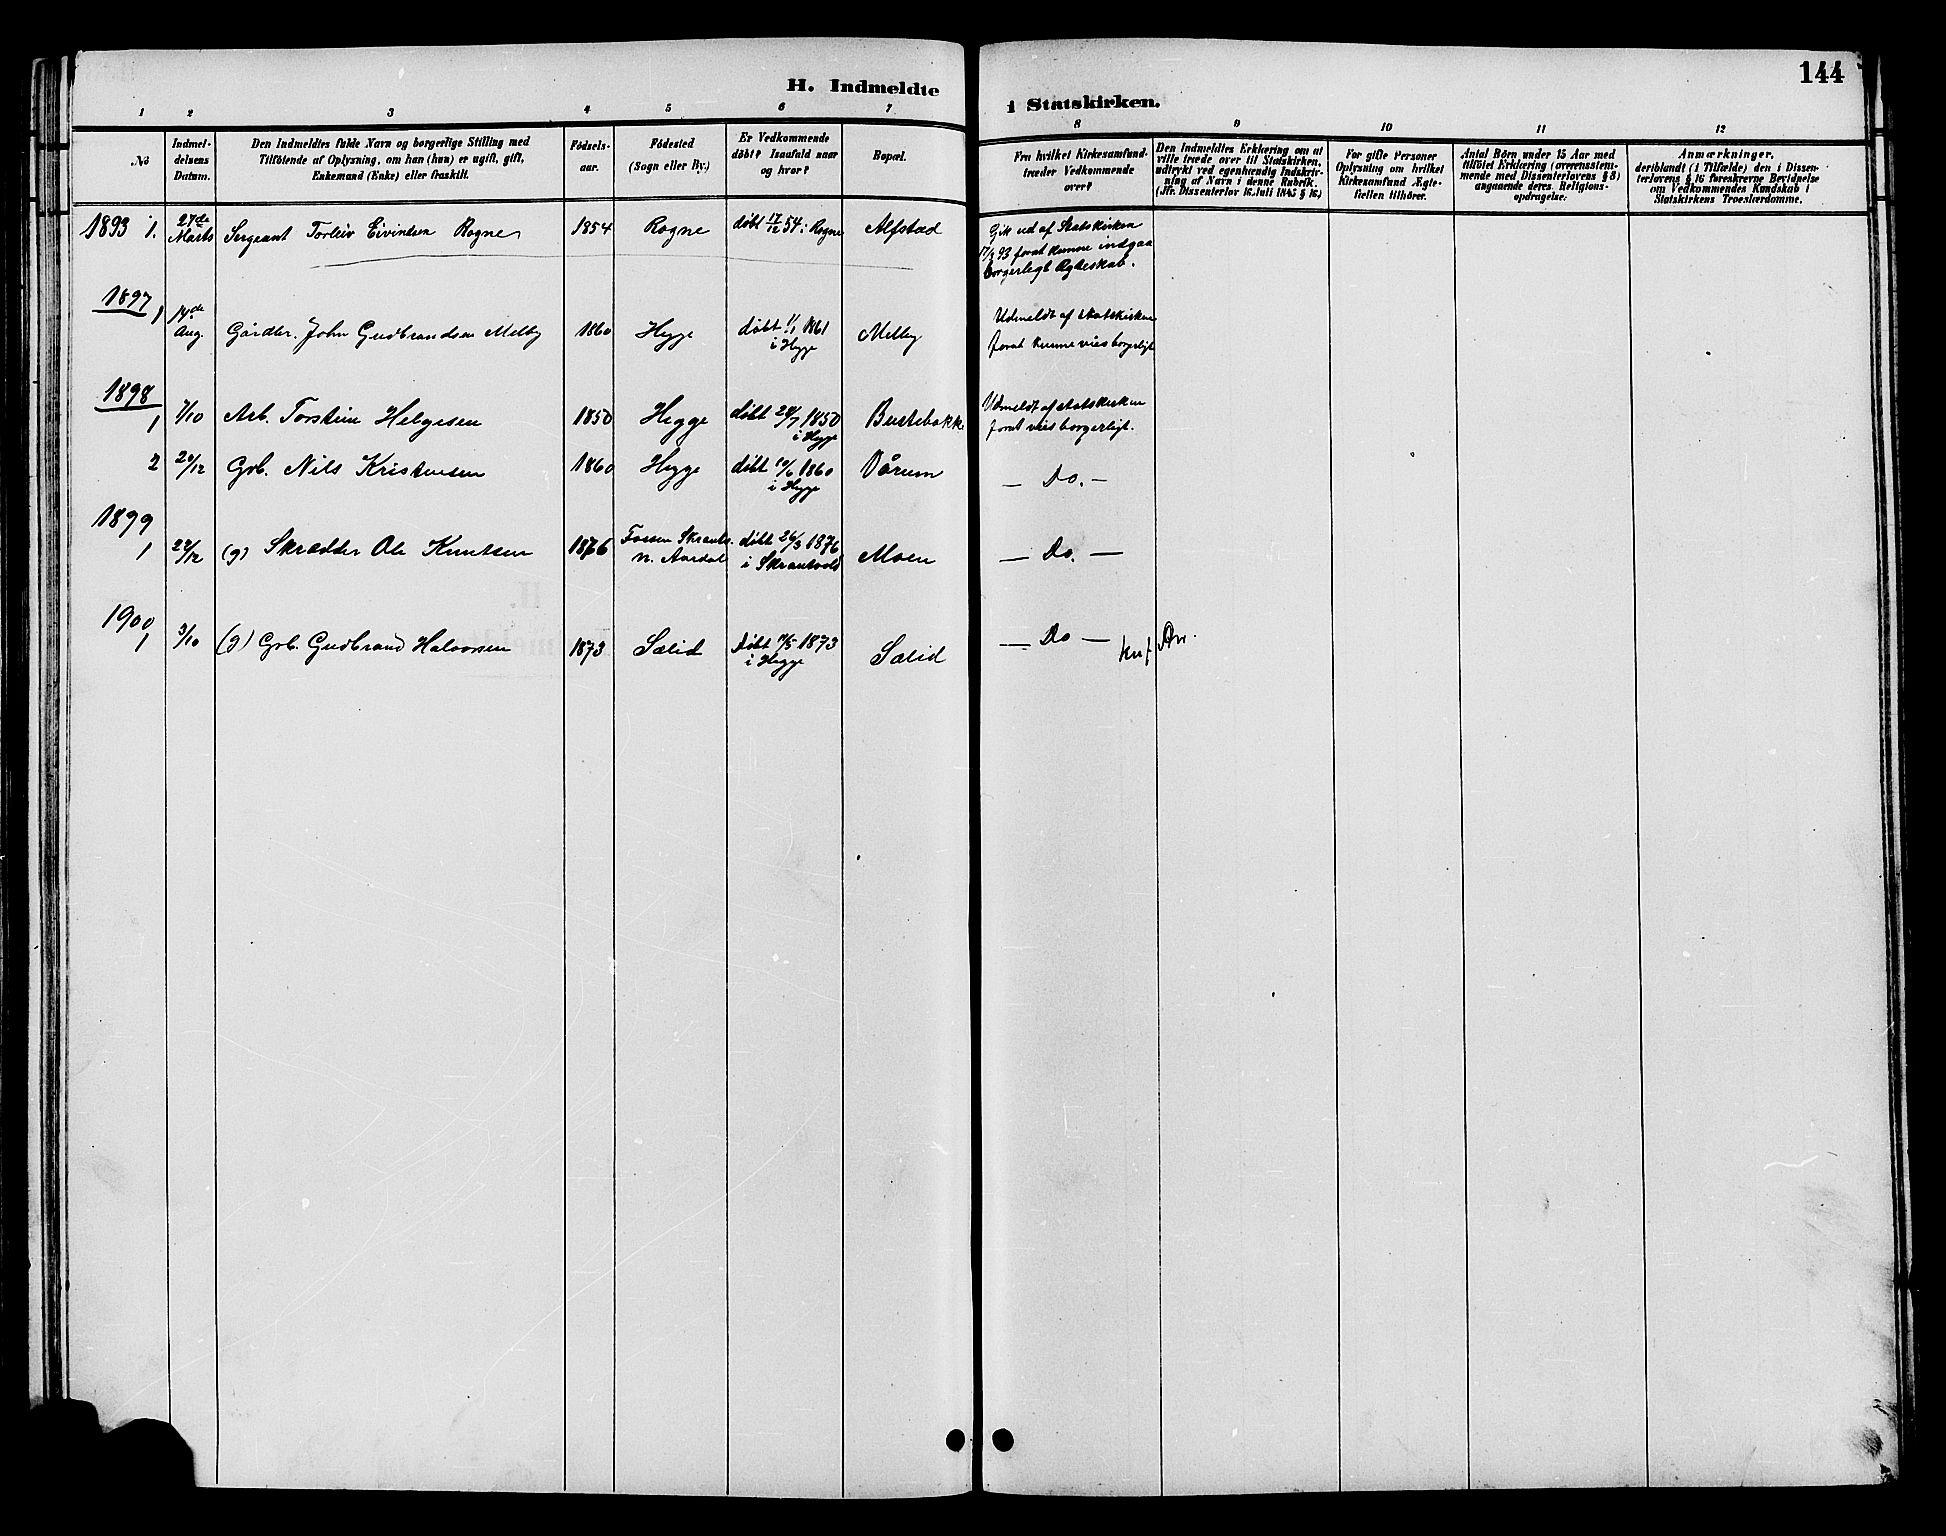 SAH, Øystre Slidre prestekontor, Klokkerbok nr. 4, 1887-1907, s. 144